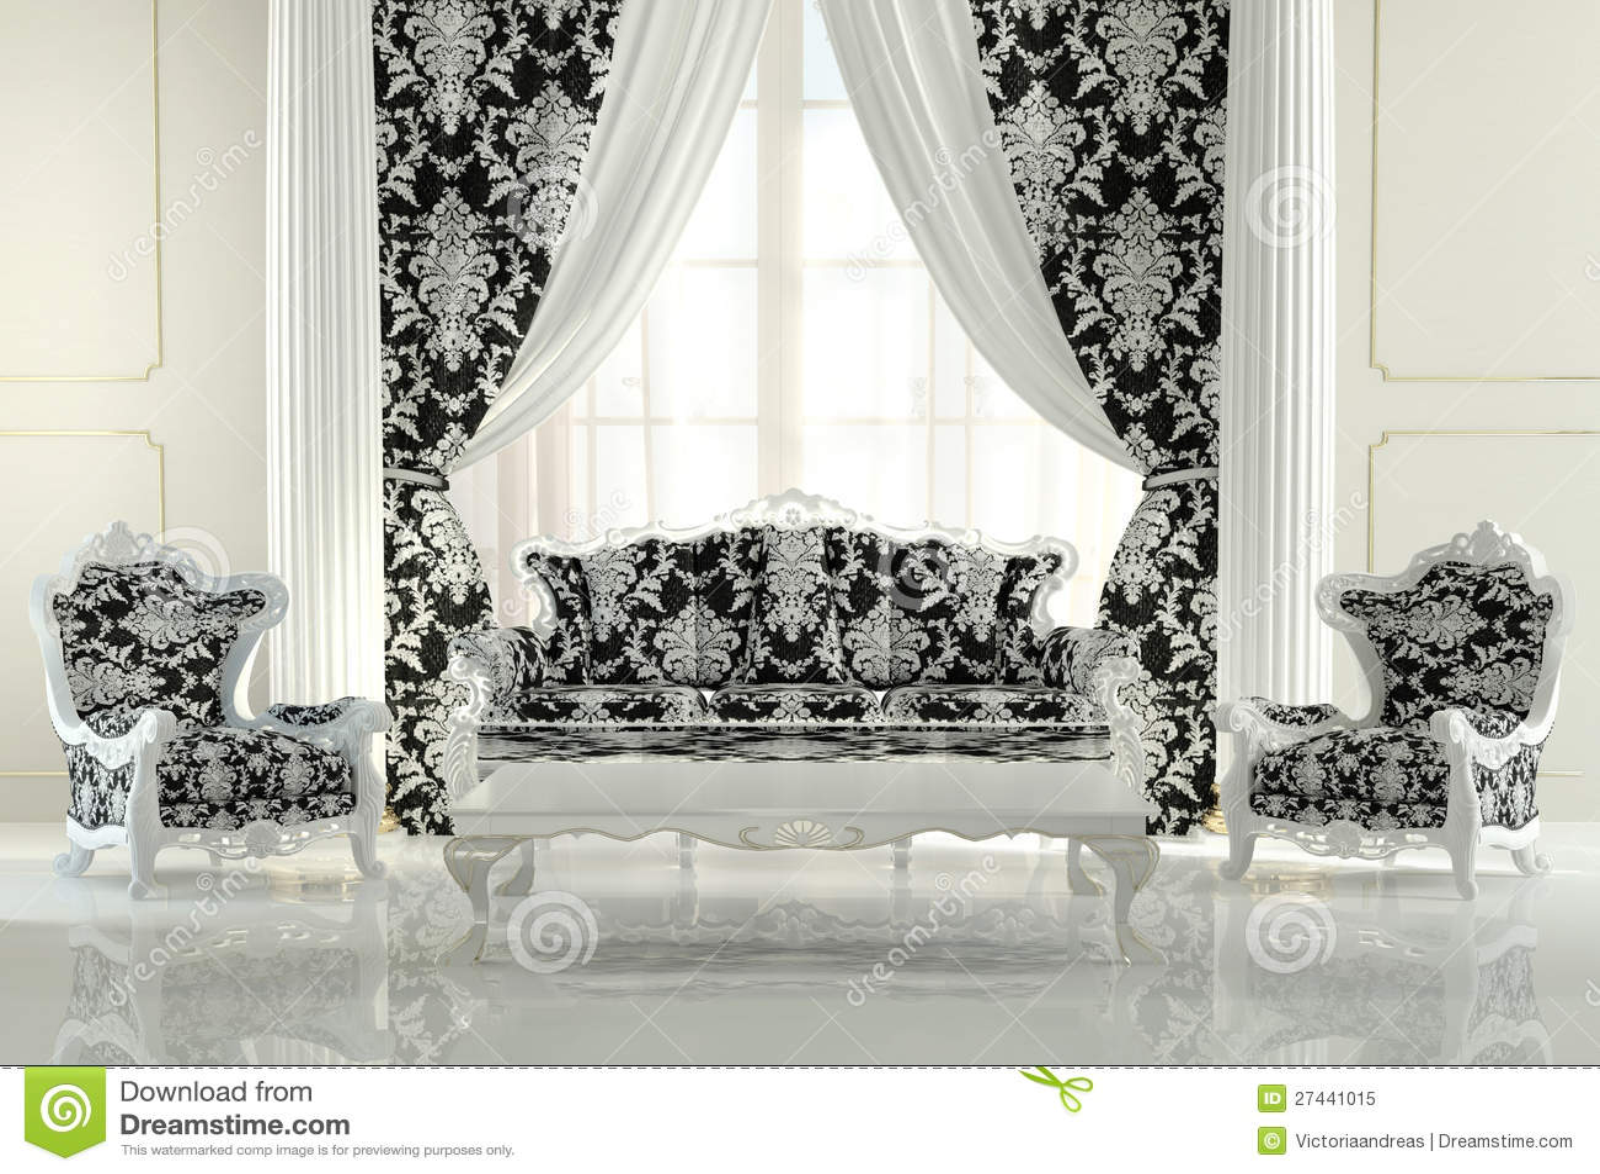 Barok En Modern : Modern meubilair in barok ontwerp stock illustratie illustratie